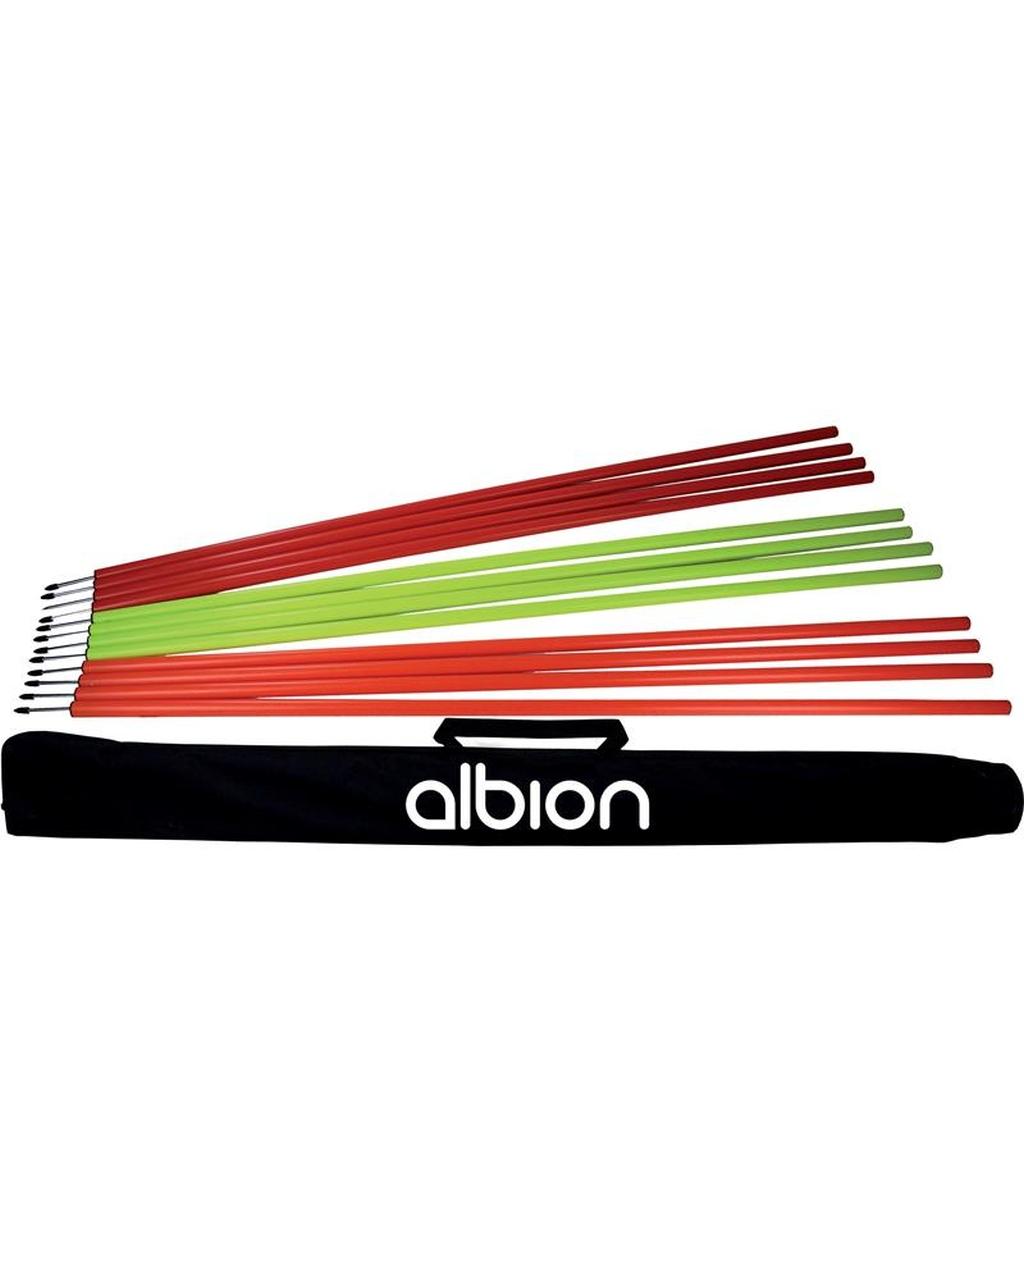 Slalom Poles set